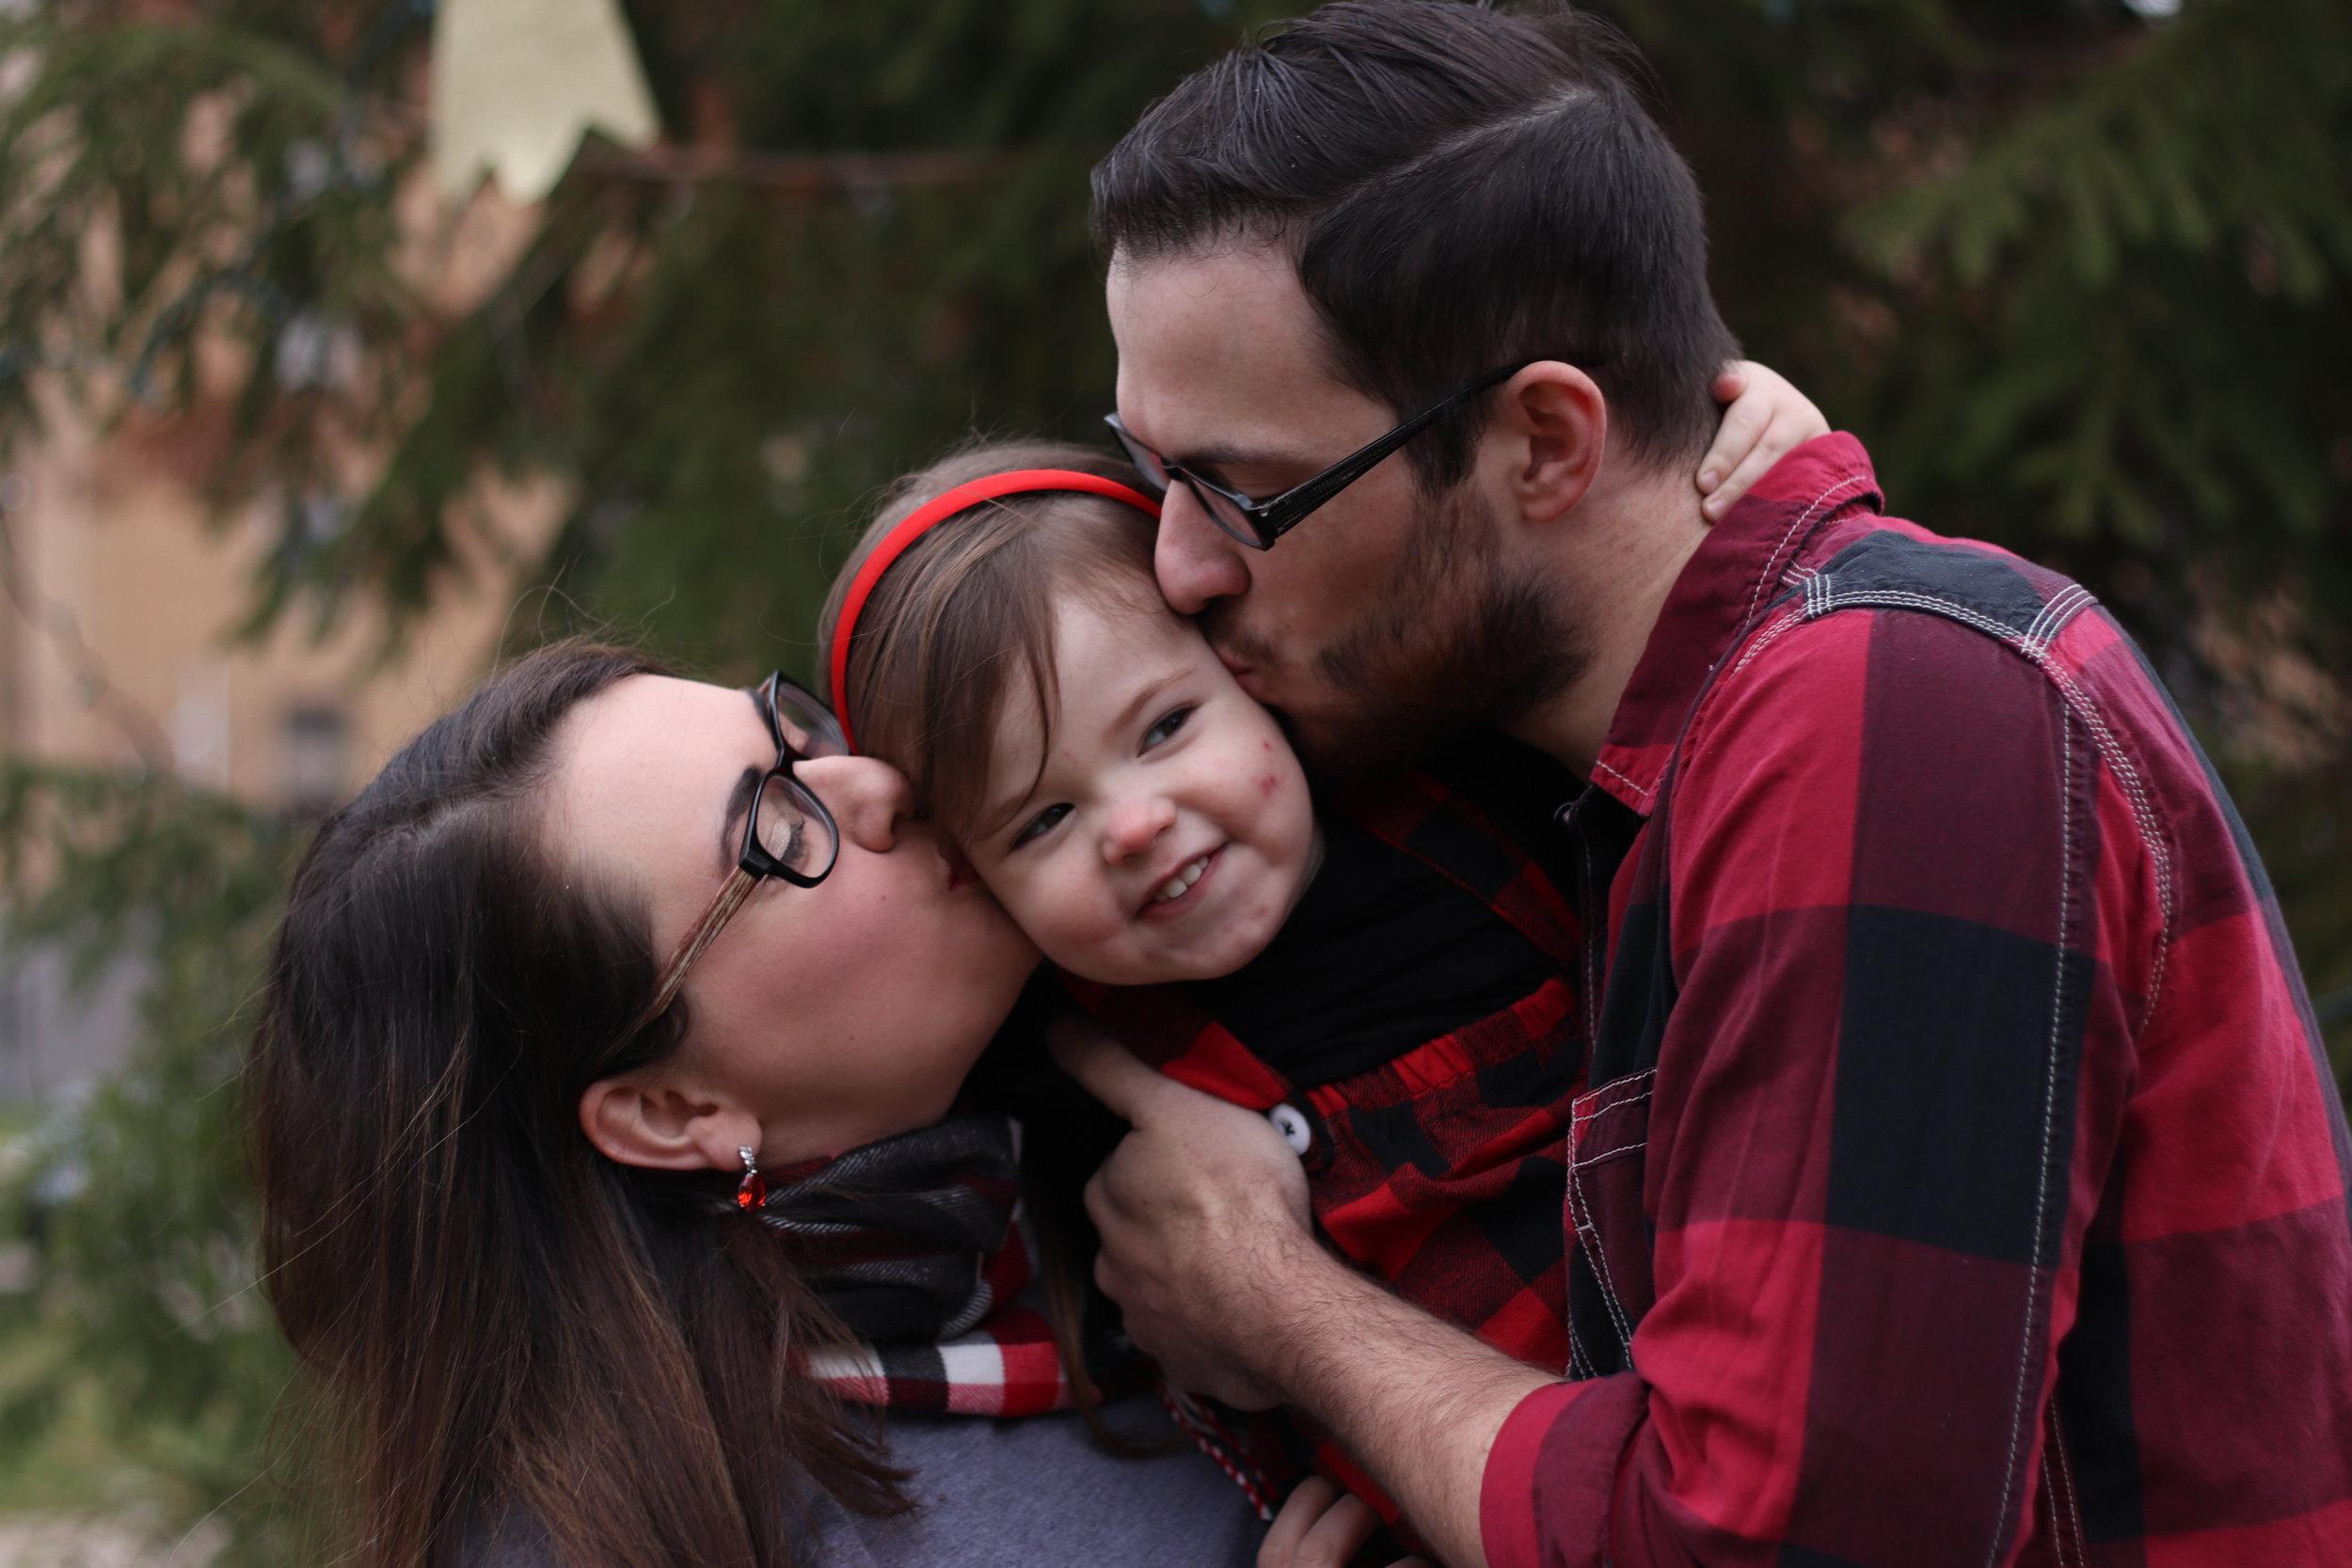 Family Photos, November 2018